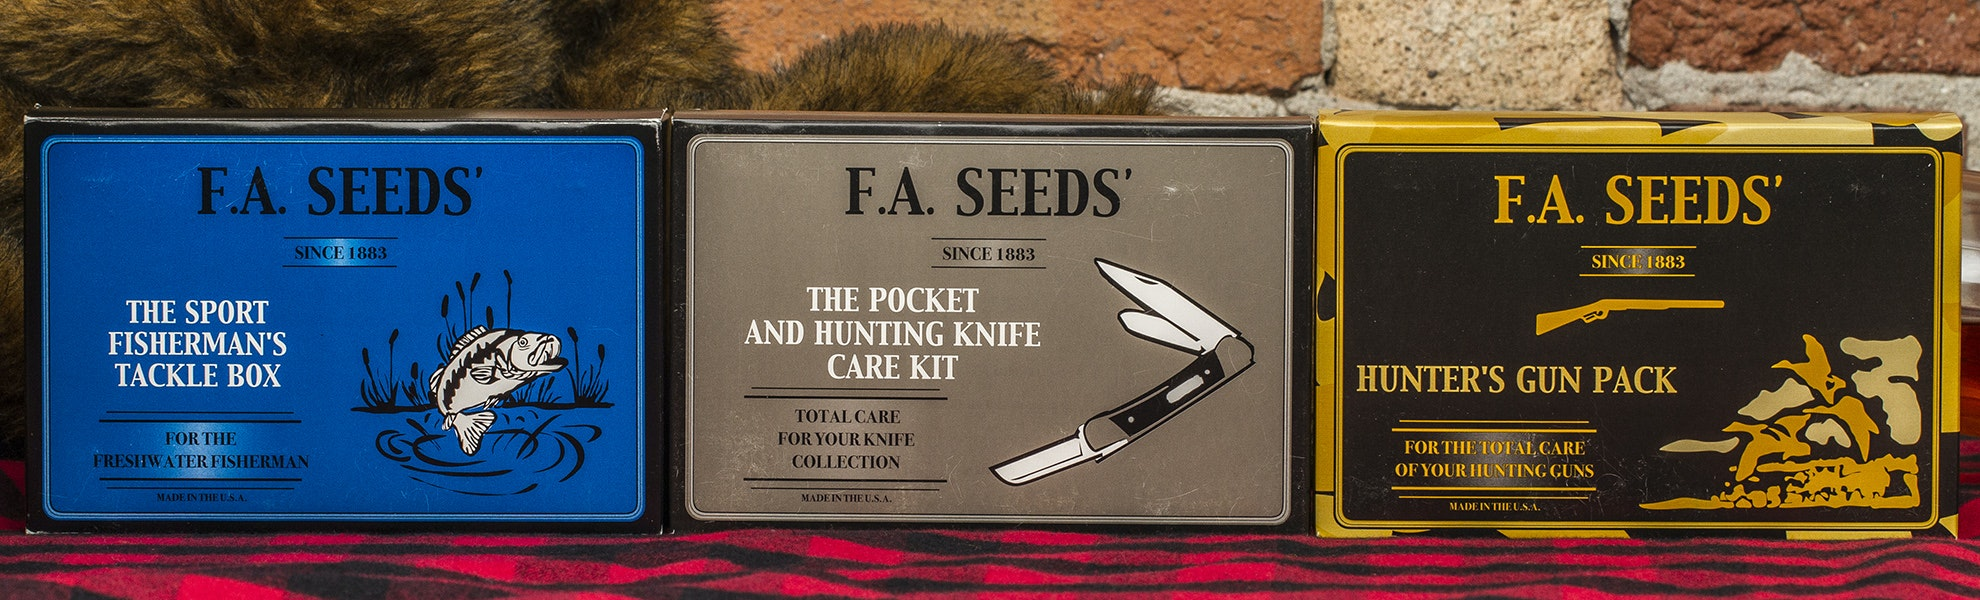 F.A. Seeds Sporting Kits